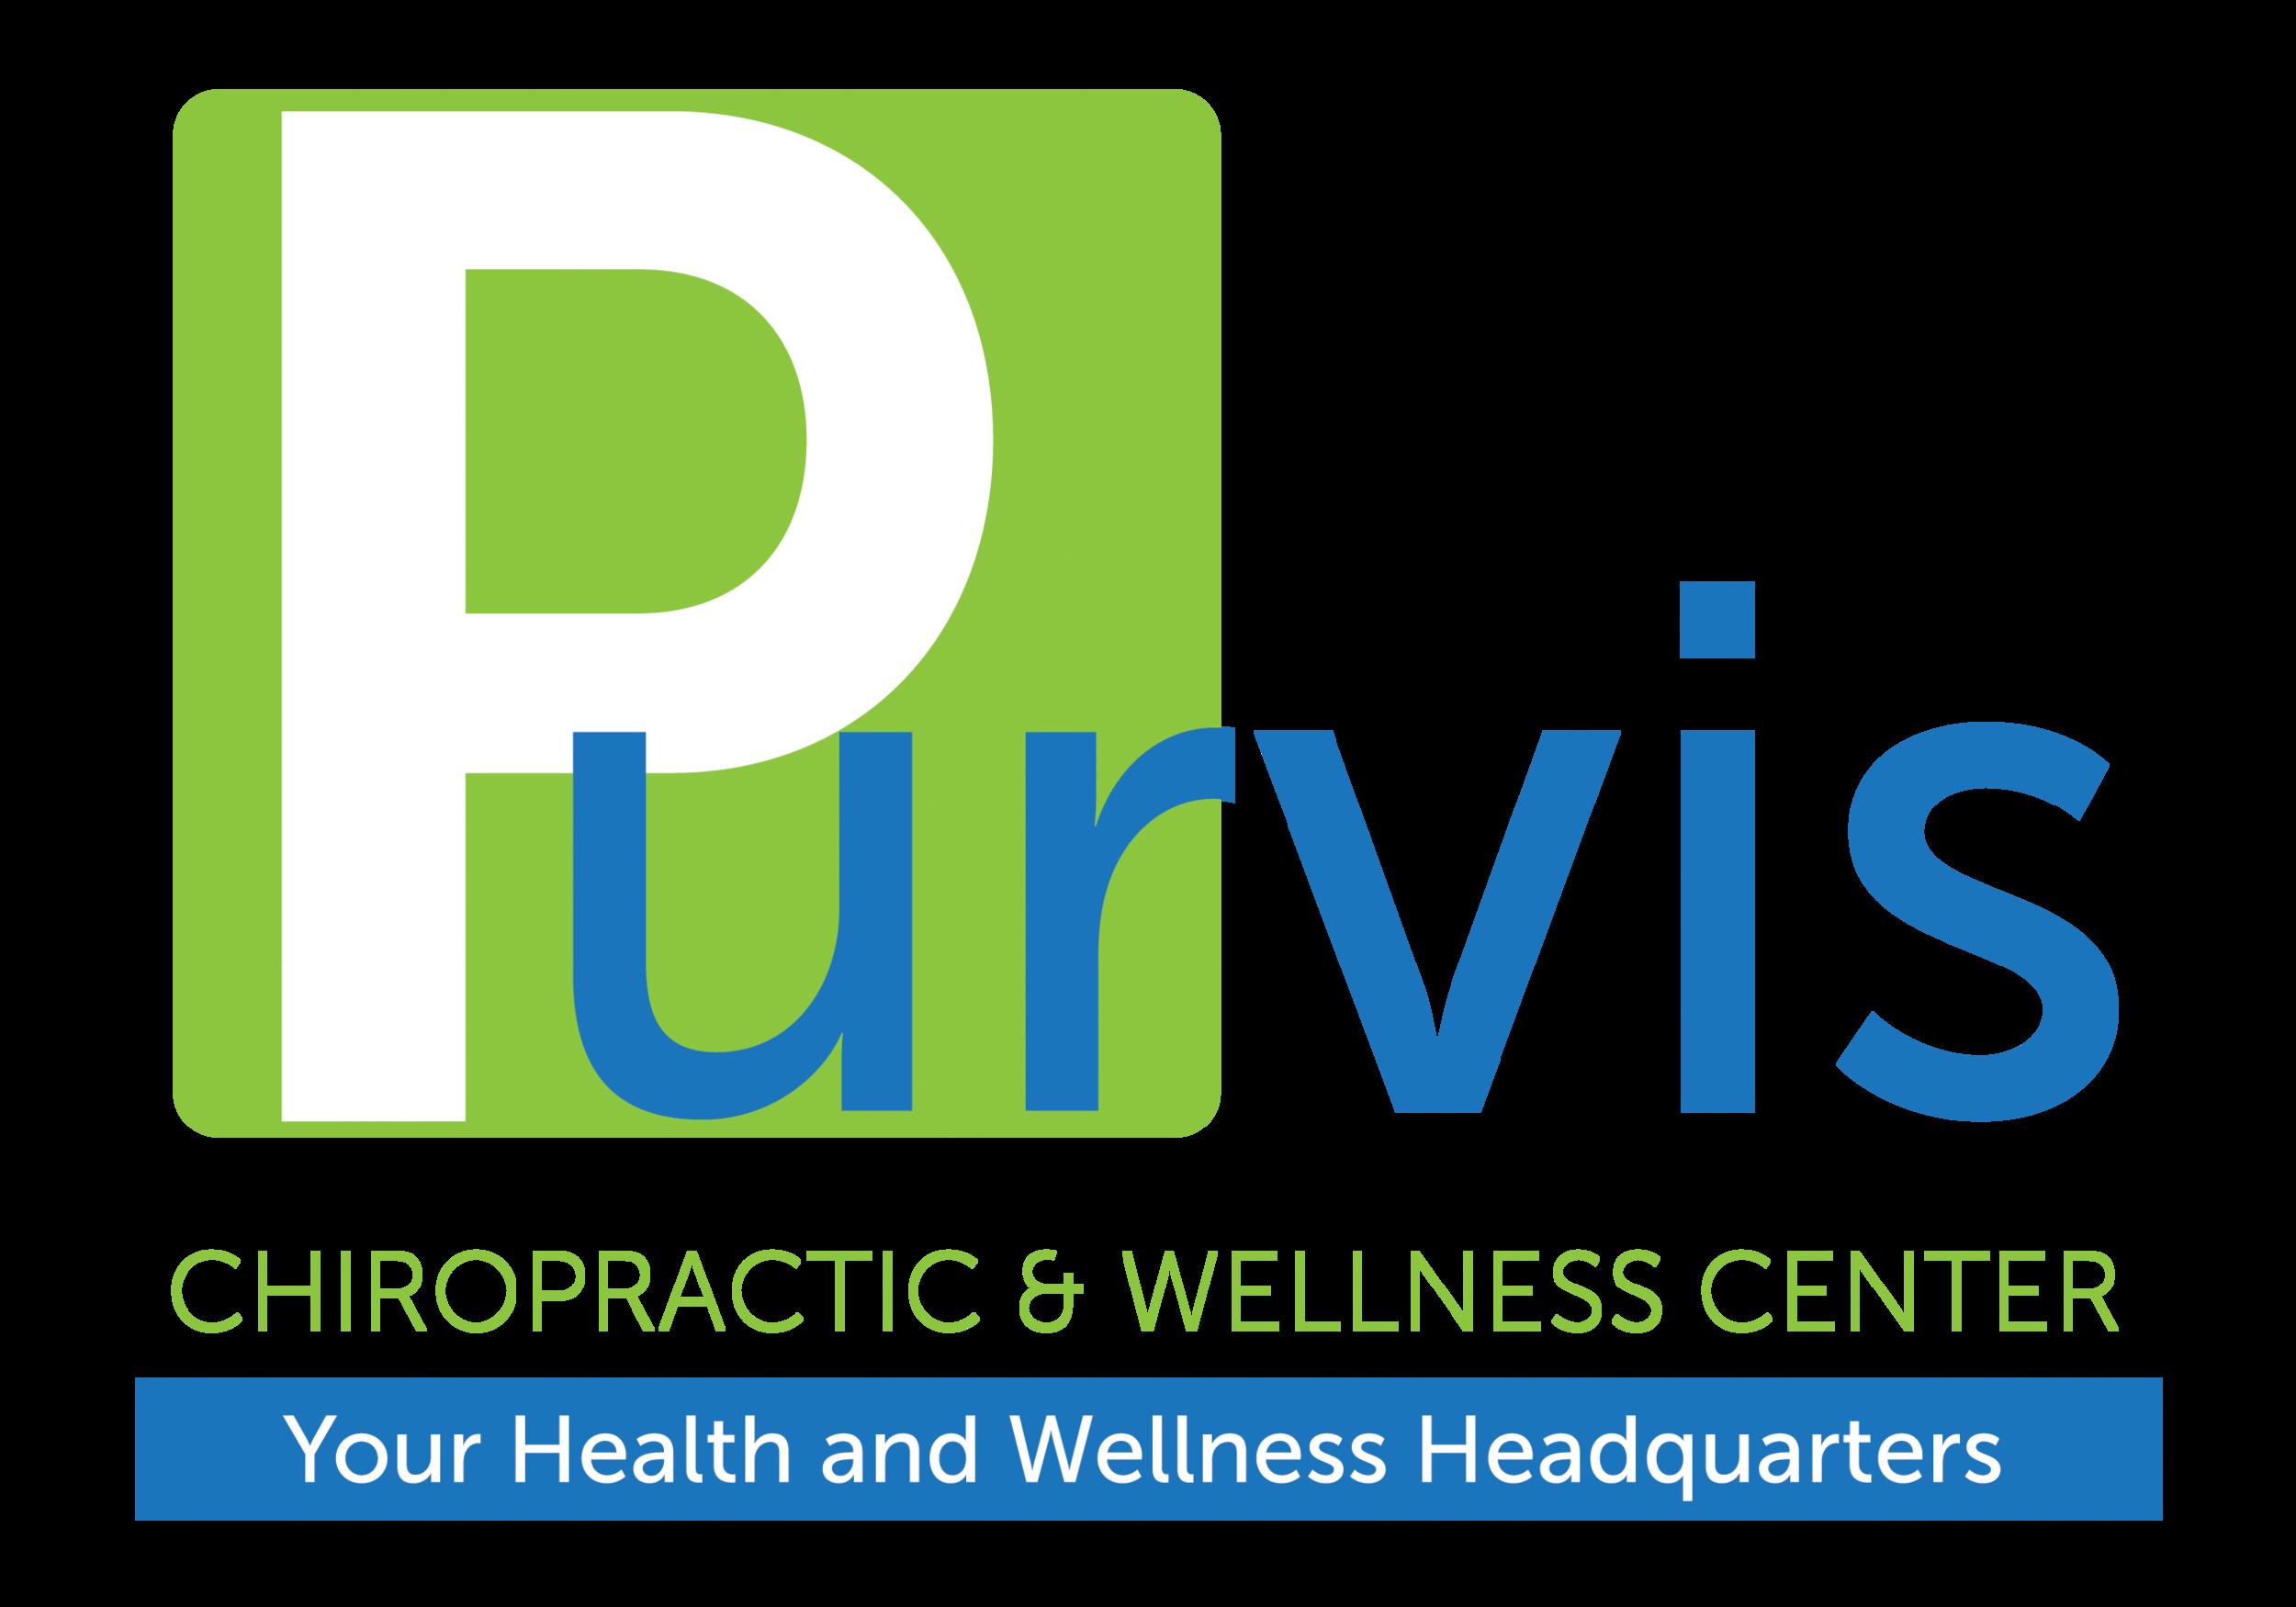 Purvis_Chiro_logo_FINAL.png